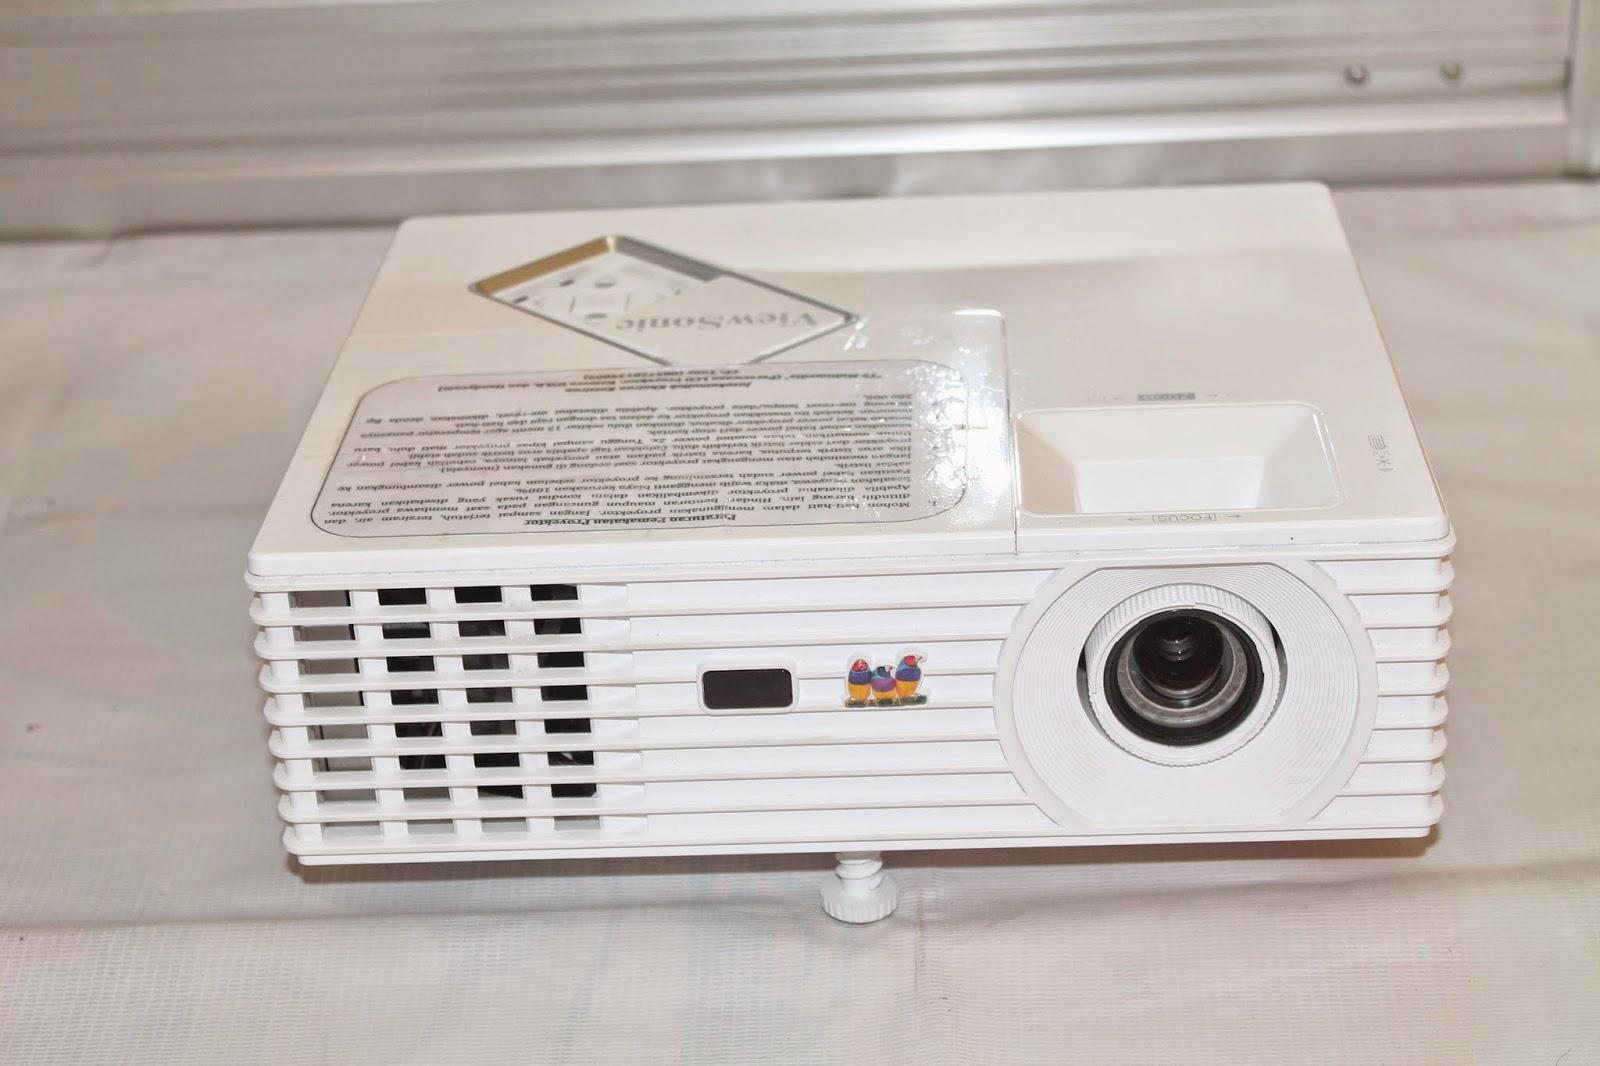 Proyektor Viewsonic PJD5234L | TS Multimedia - Sewa menyewa jadi lebih mudah di Spotsewa